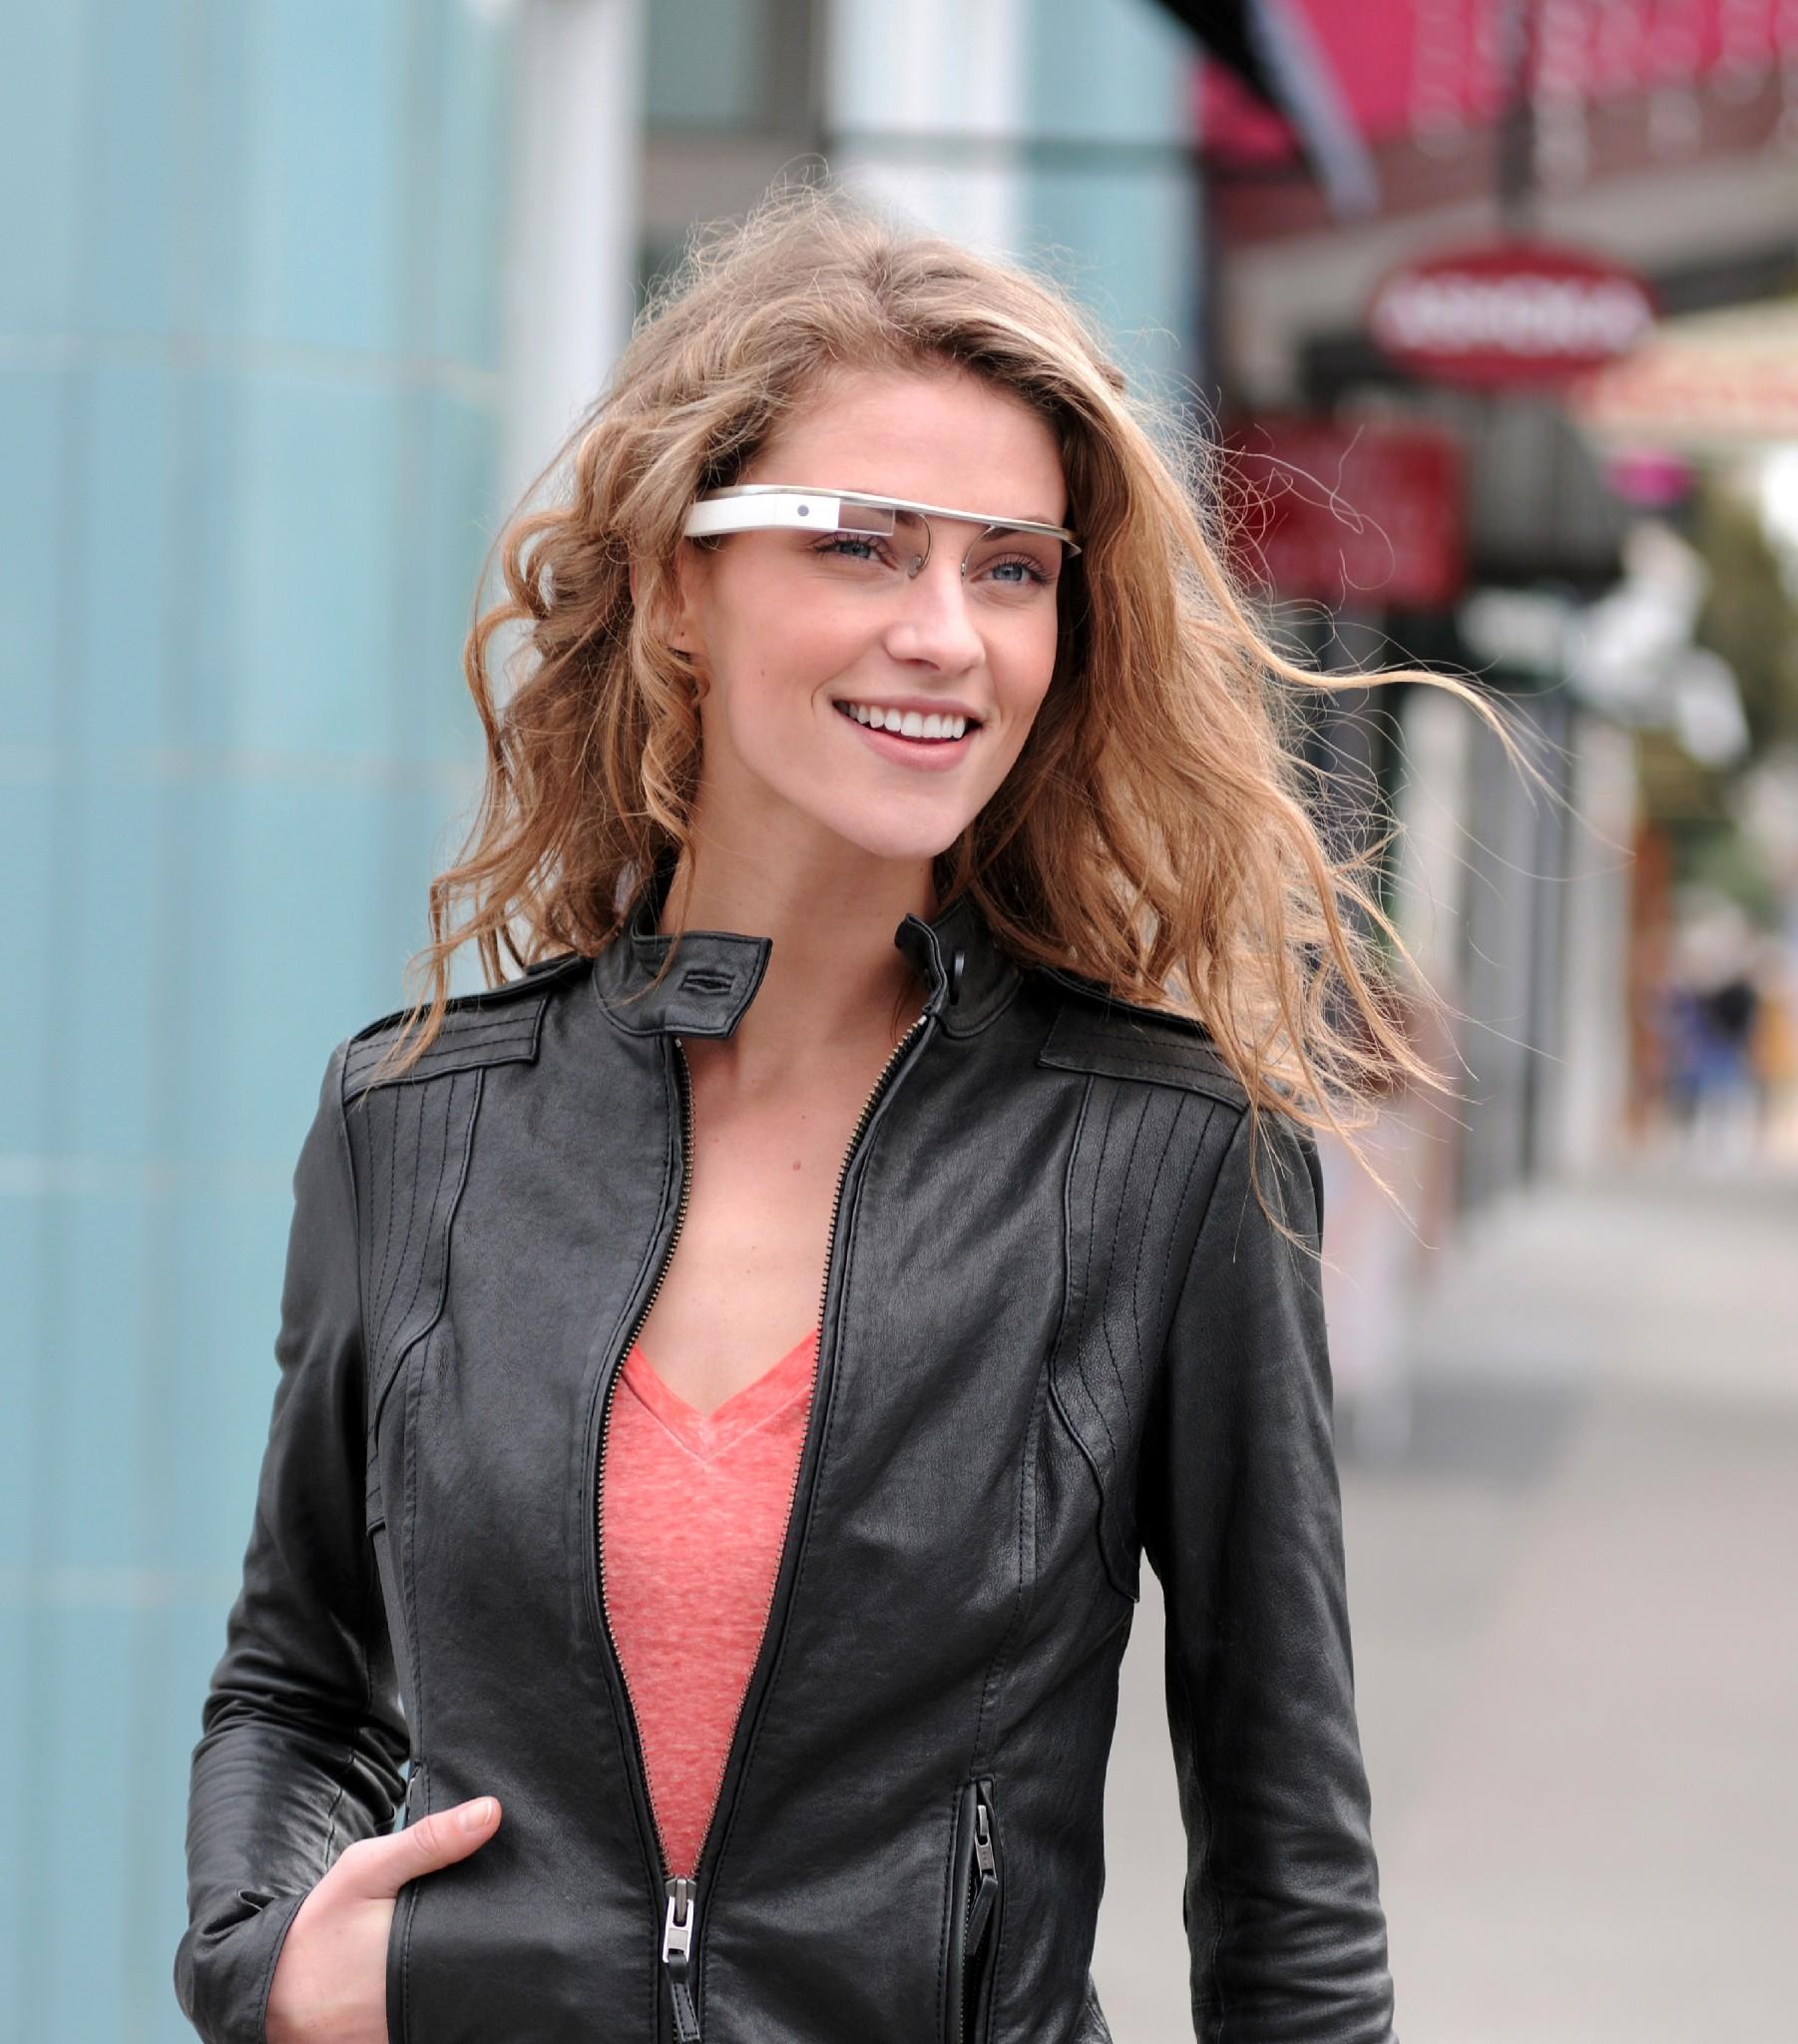 Edinburgh Airport to Equip Staff with Google Glass